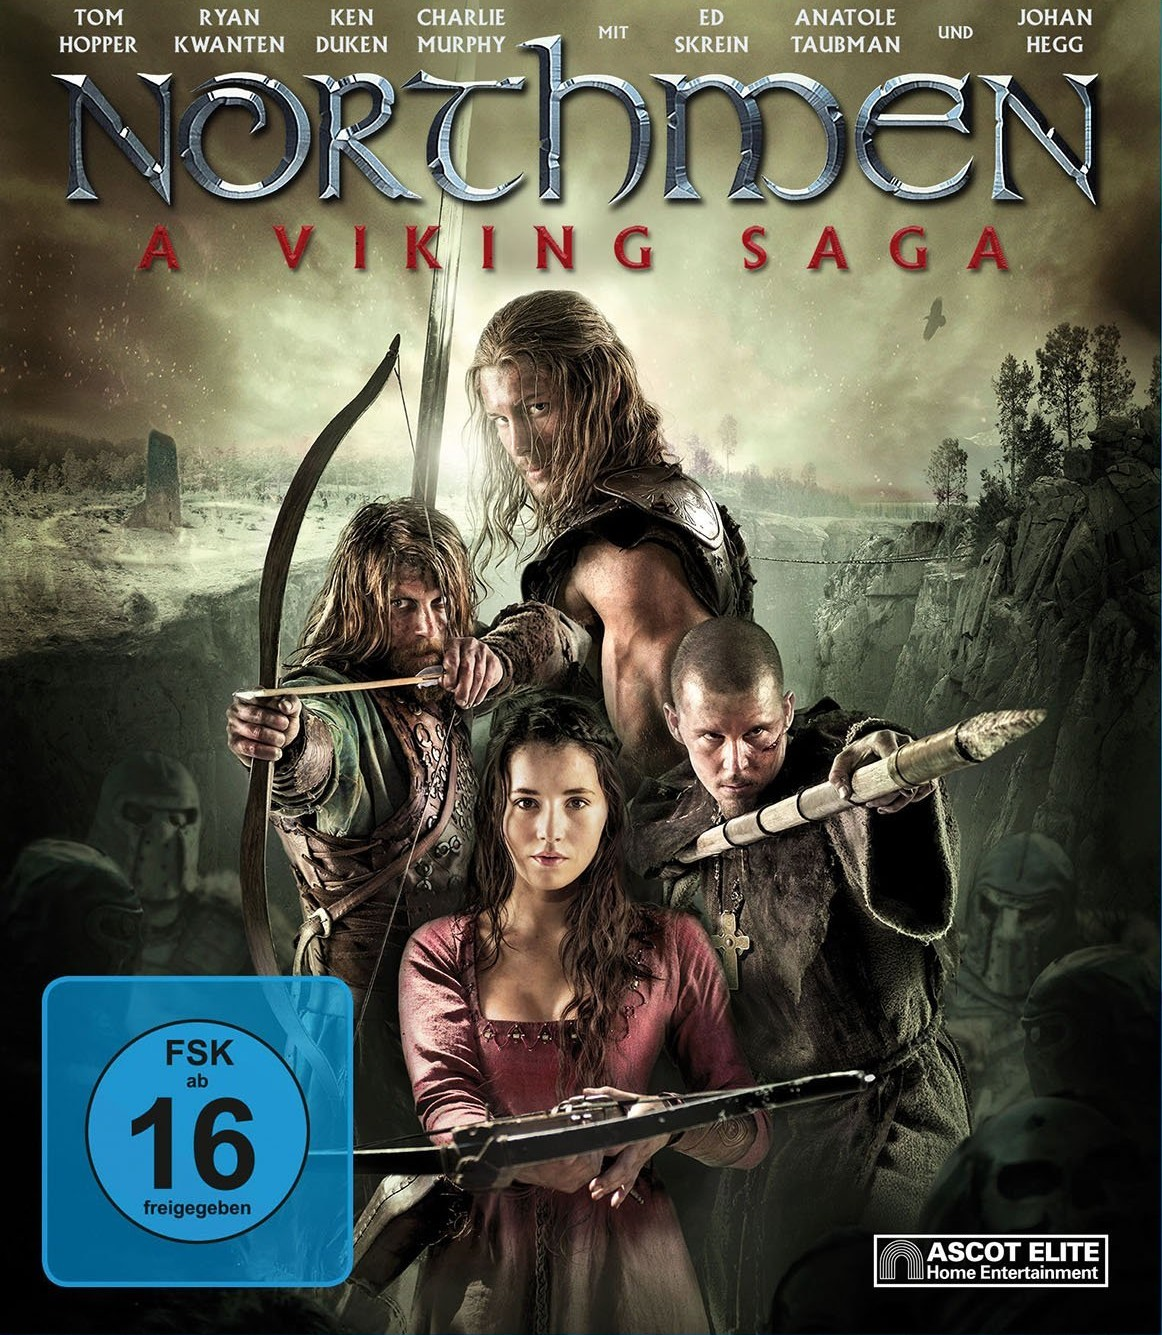 Northmen – A Viking Saga (Spielfilm, DVD/Blu-Ray)